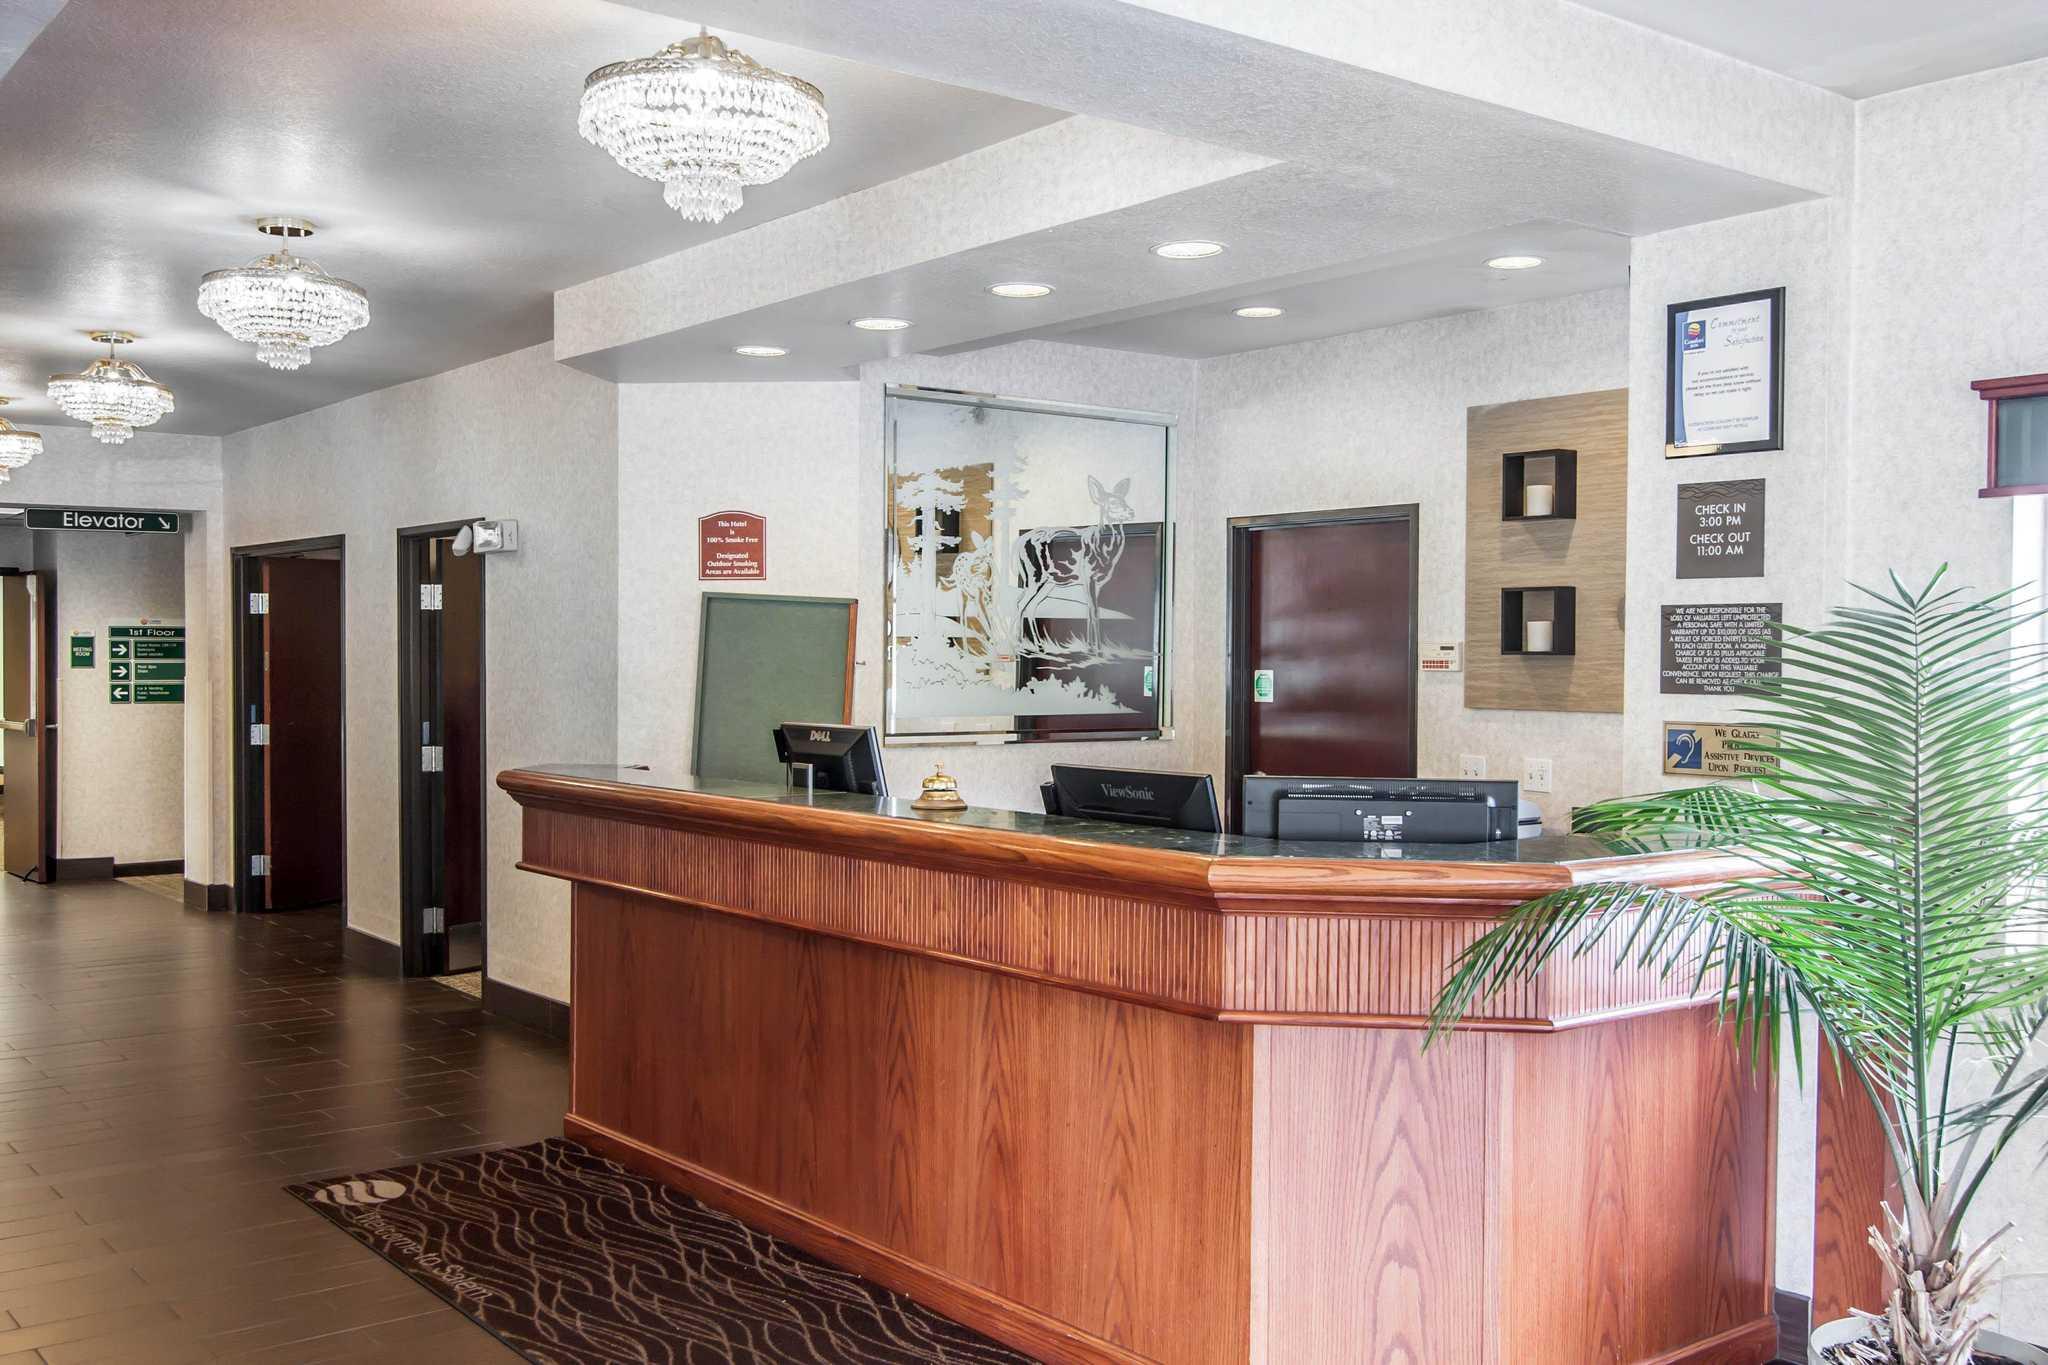 Comfort Inn & Suites image 29